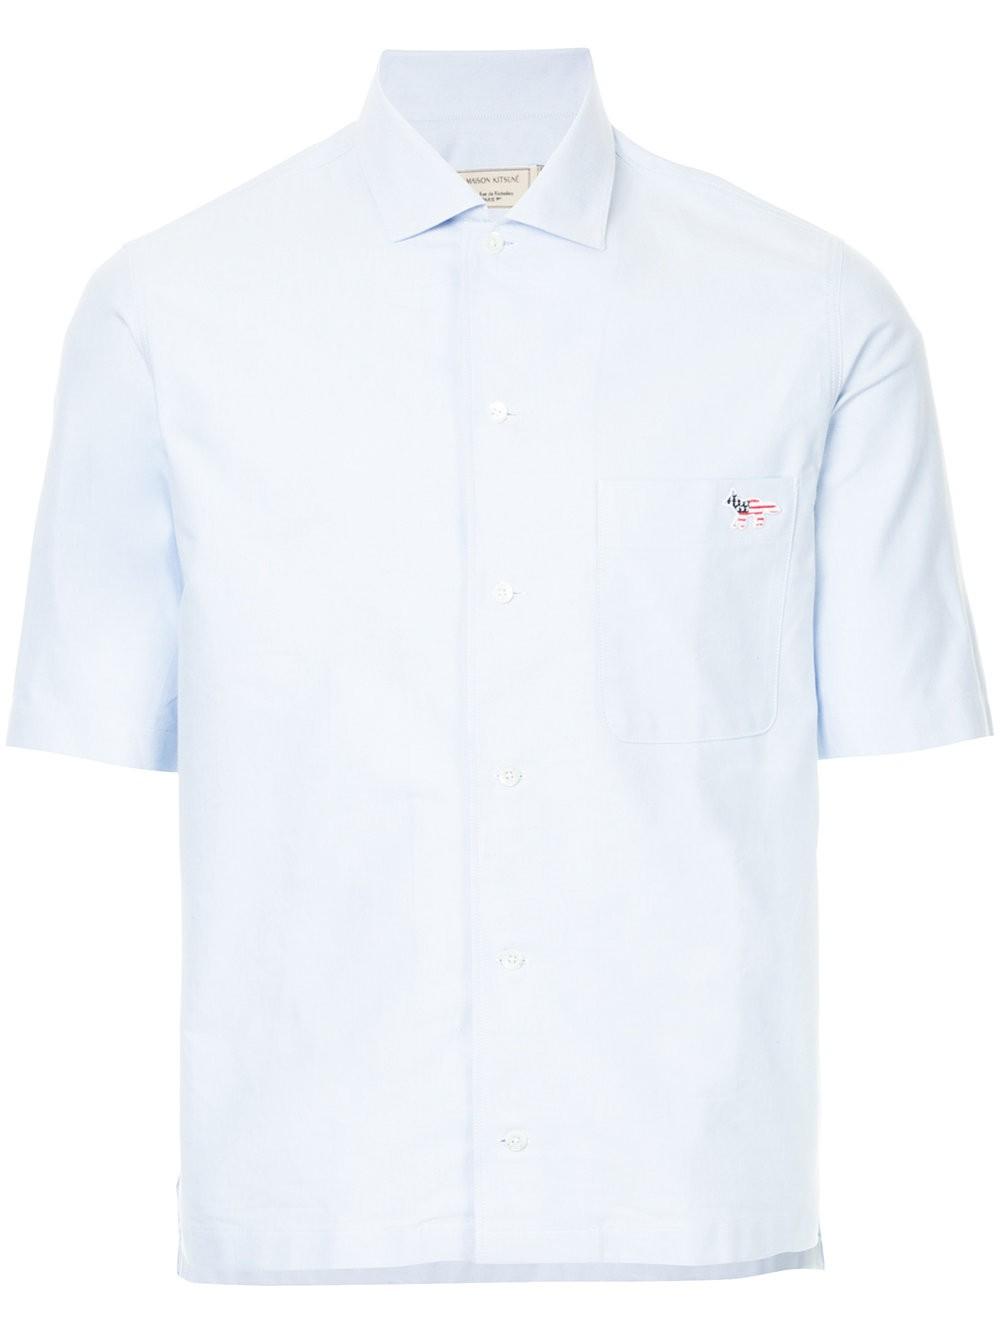 Camisa Oxford de Maison Kitsuné.